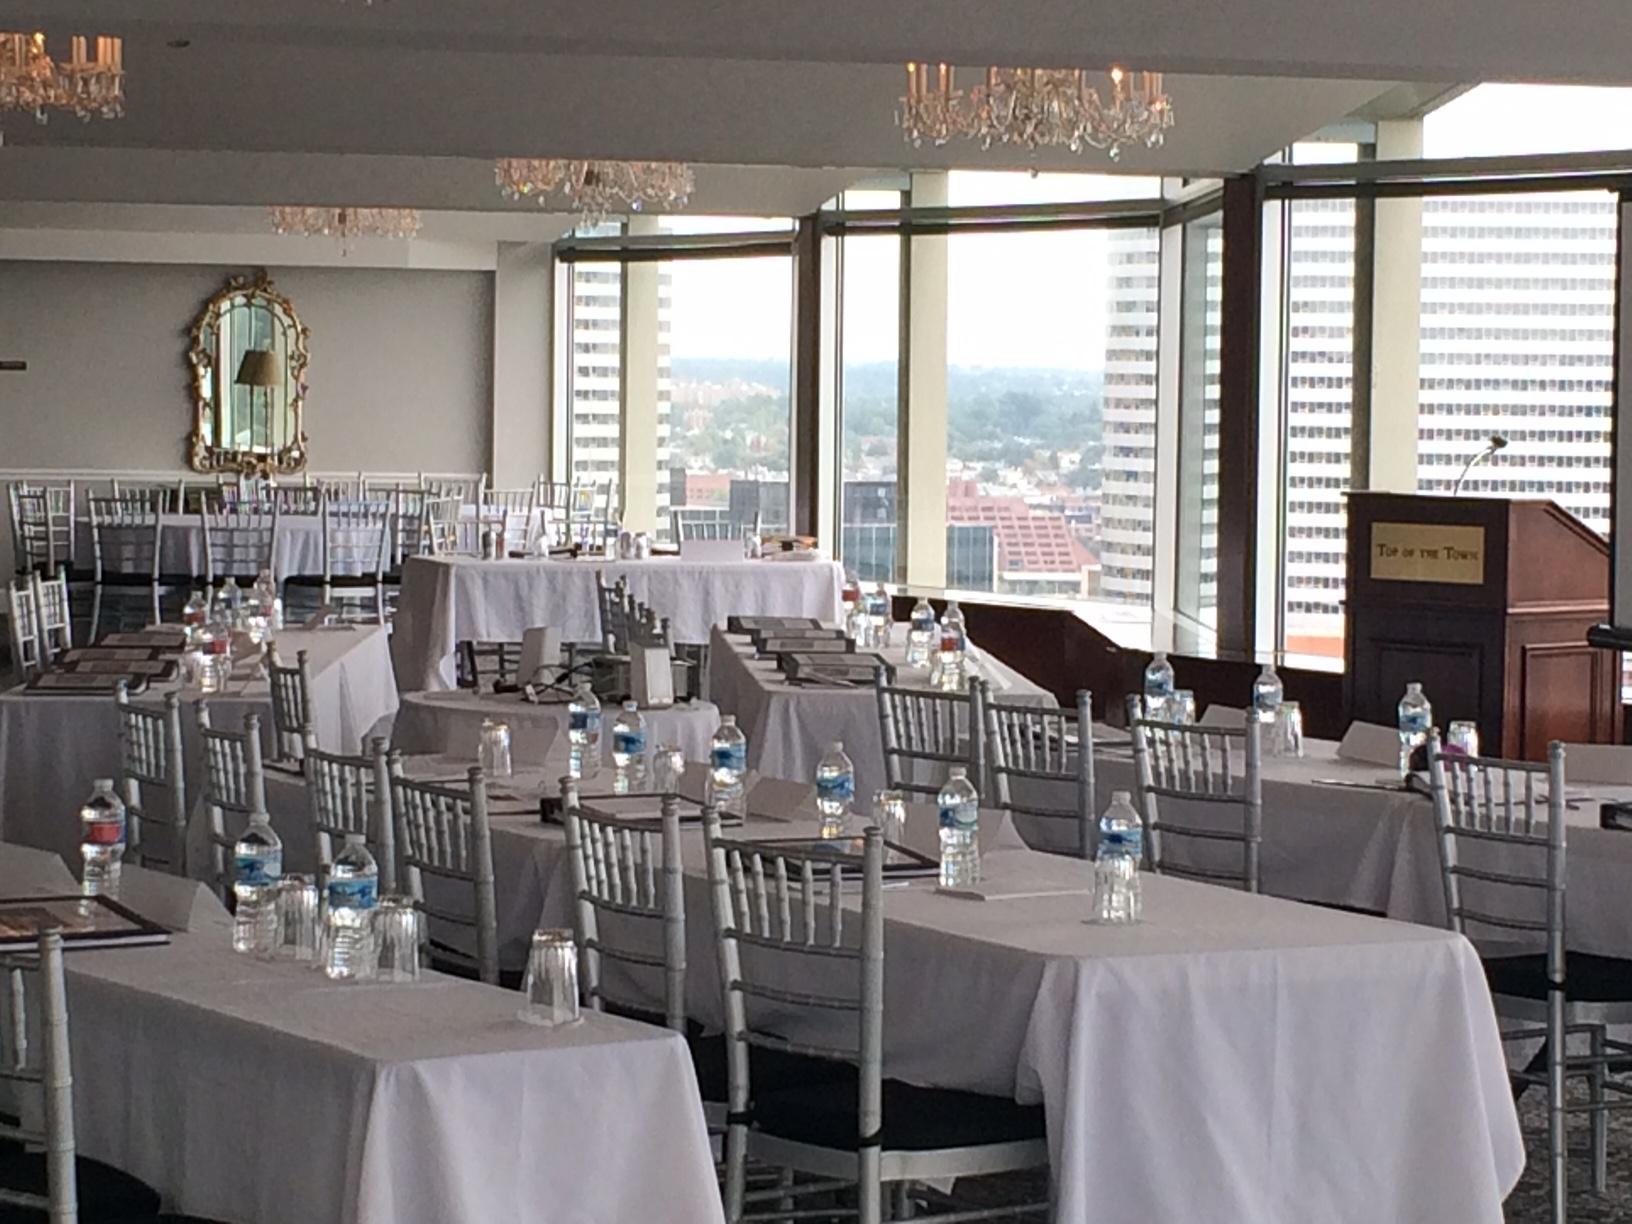 Corporate Meeting - classroom style.jpg